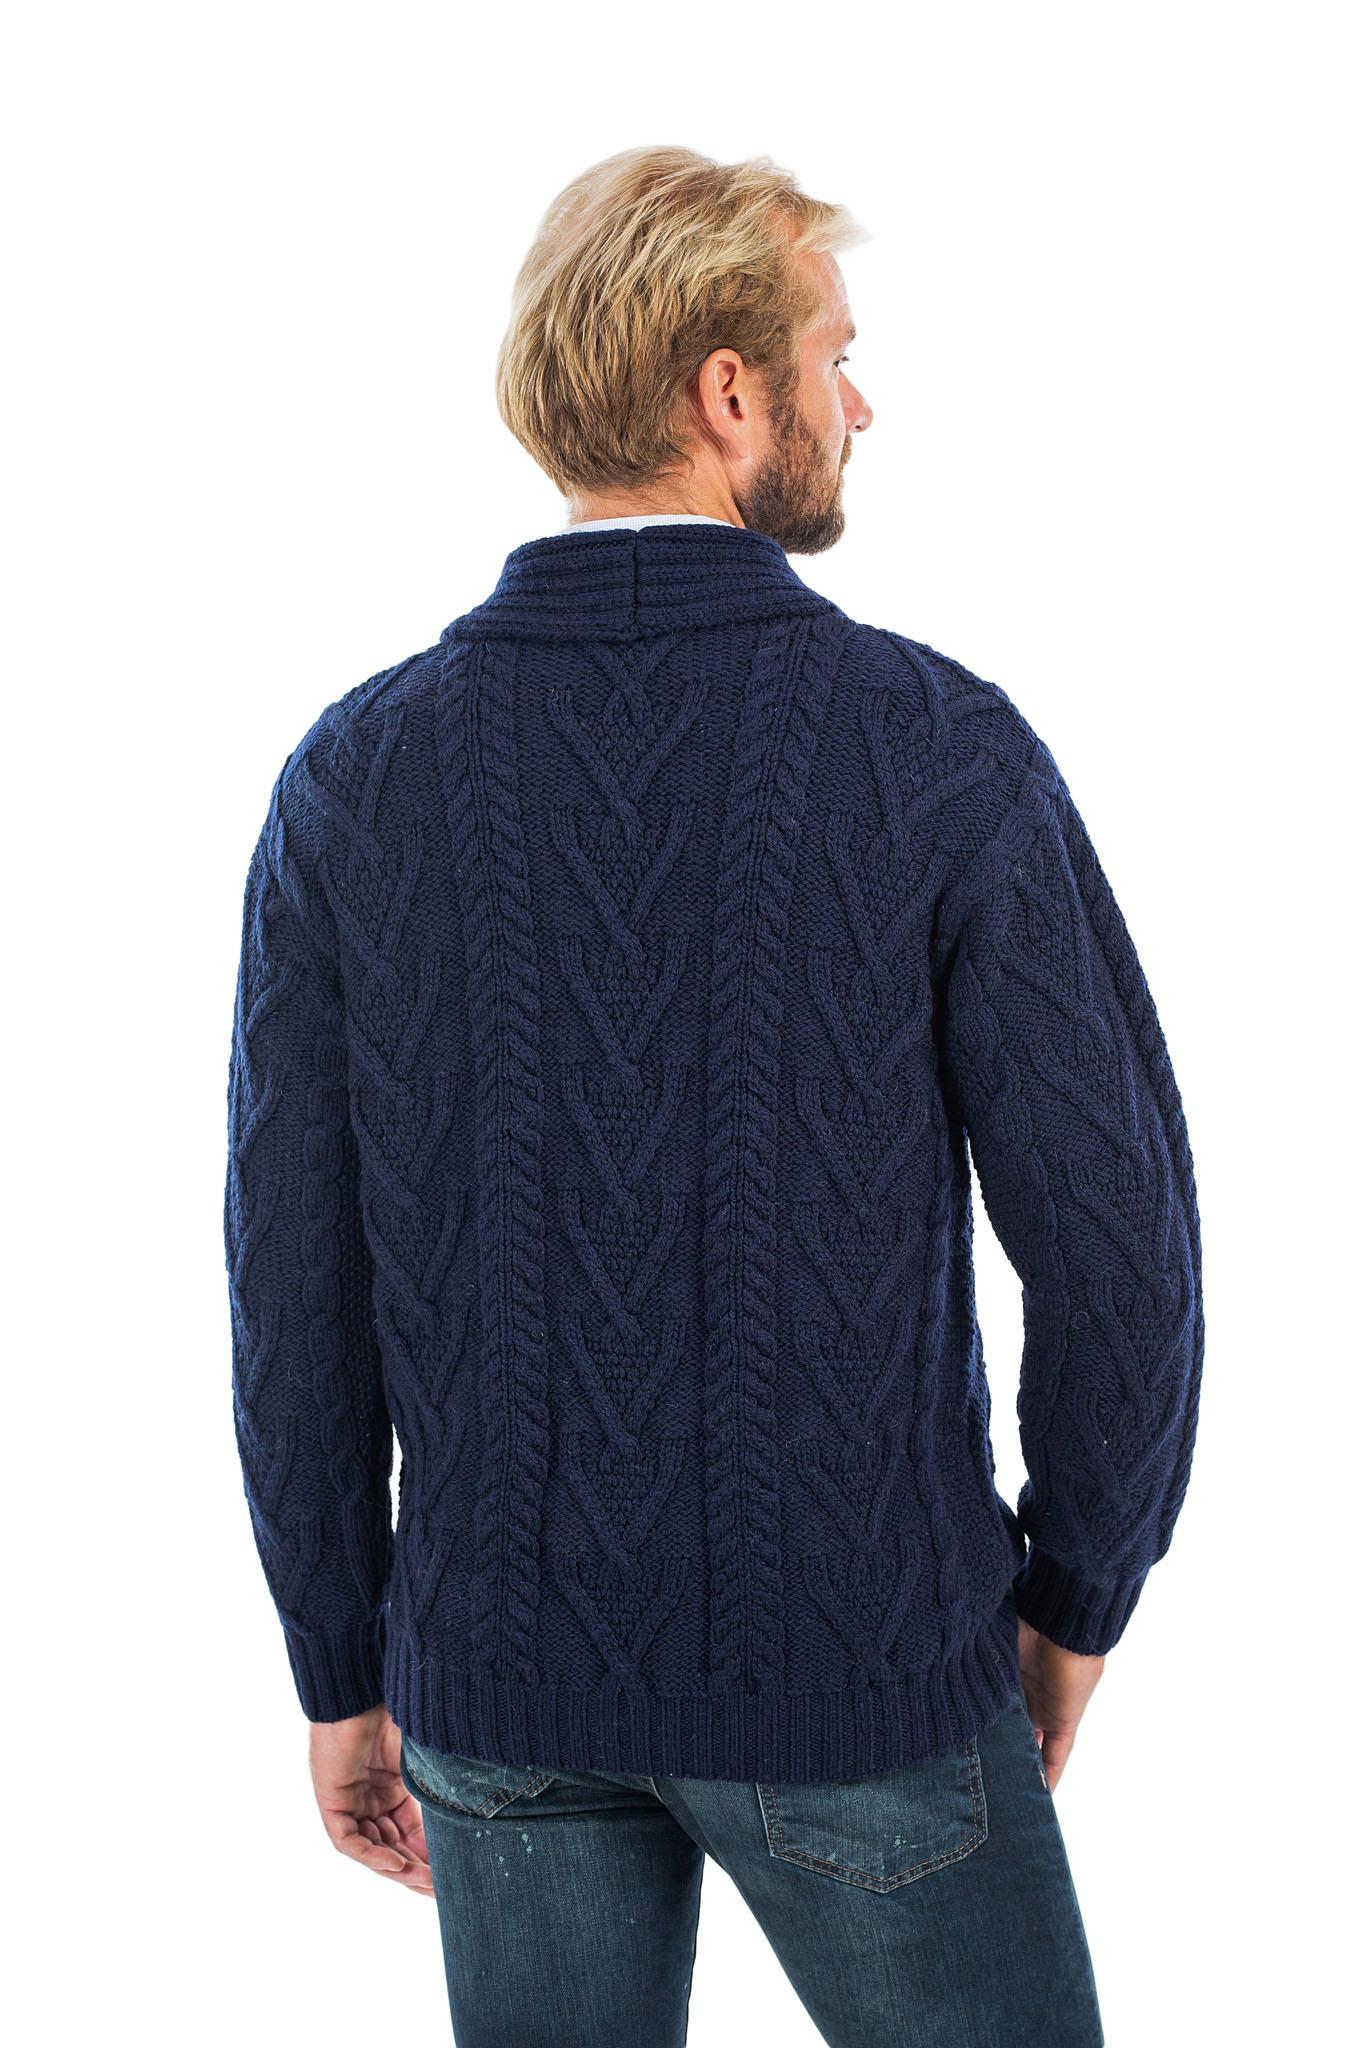 SAOL-Mens-Irish-Merino-Wool-Cardigan-Shawl-Collar-Front-Pockets-Aran-Cable-Knit thumbnail 19